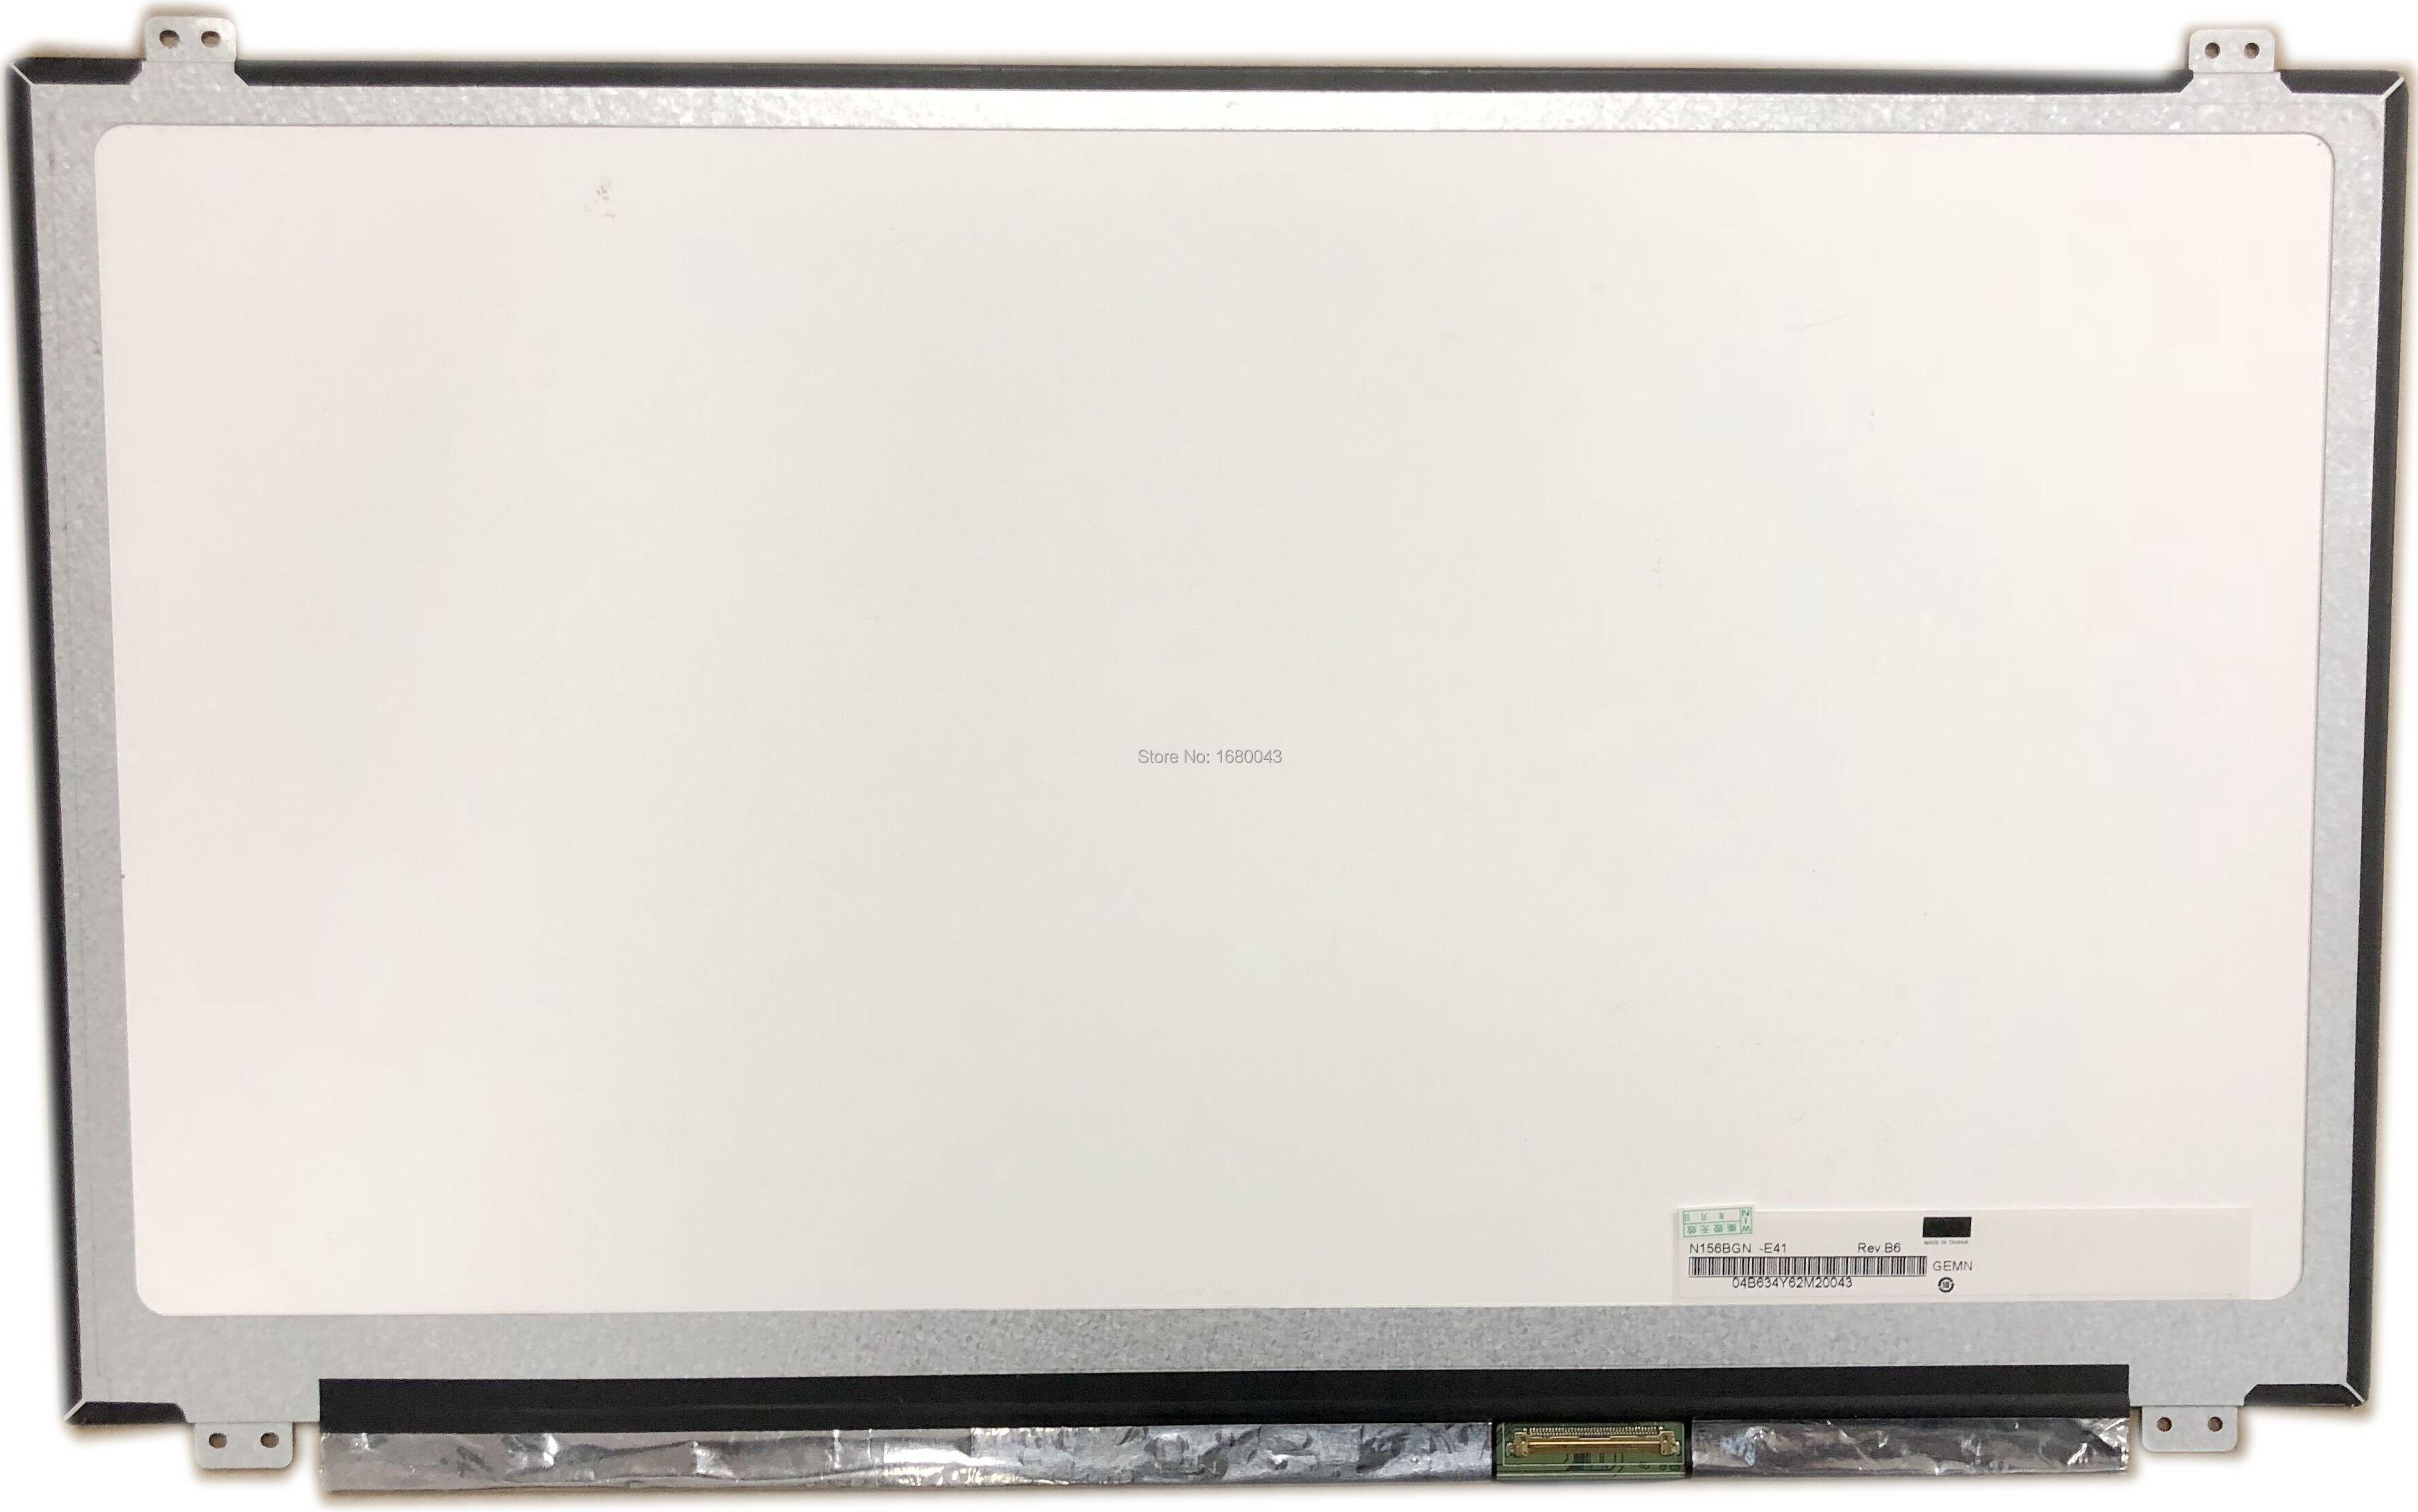 N156BGN-E41 fit LTN156AT40 B156XTK01.0 NT156WHM-T00 With TOUCH SCREEN Digitizer LED Display Laptop Screen 40 pinsN156BGN-E41 fit LTN156AT40 B156XTK01.0 NT156WHM-T00 With TOUCH SCREEN Digitizer LED Display Laptop Screen 40 pins